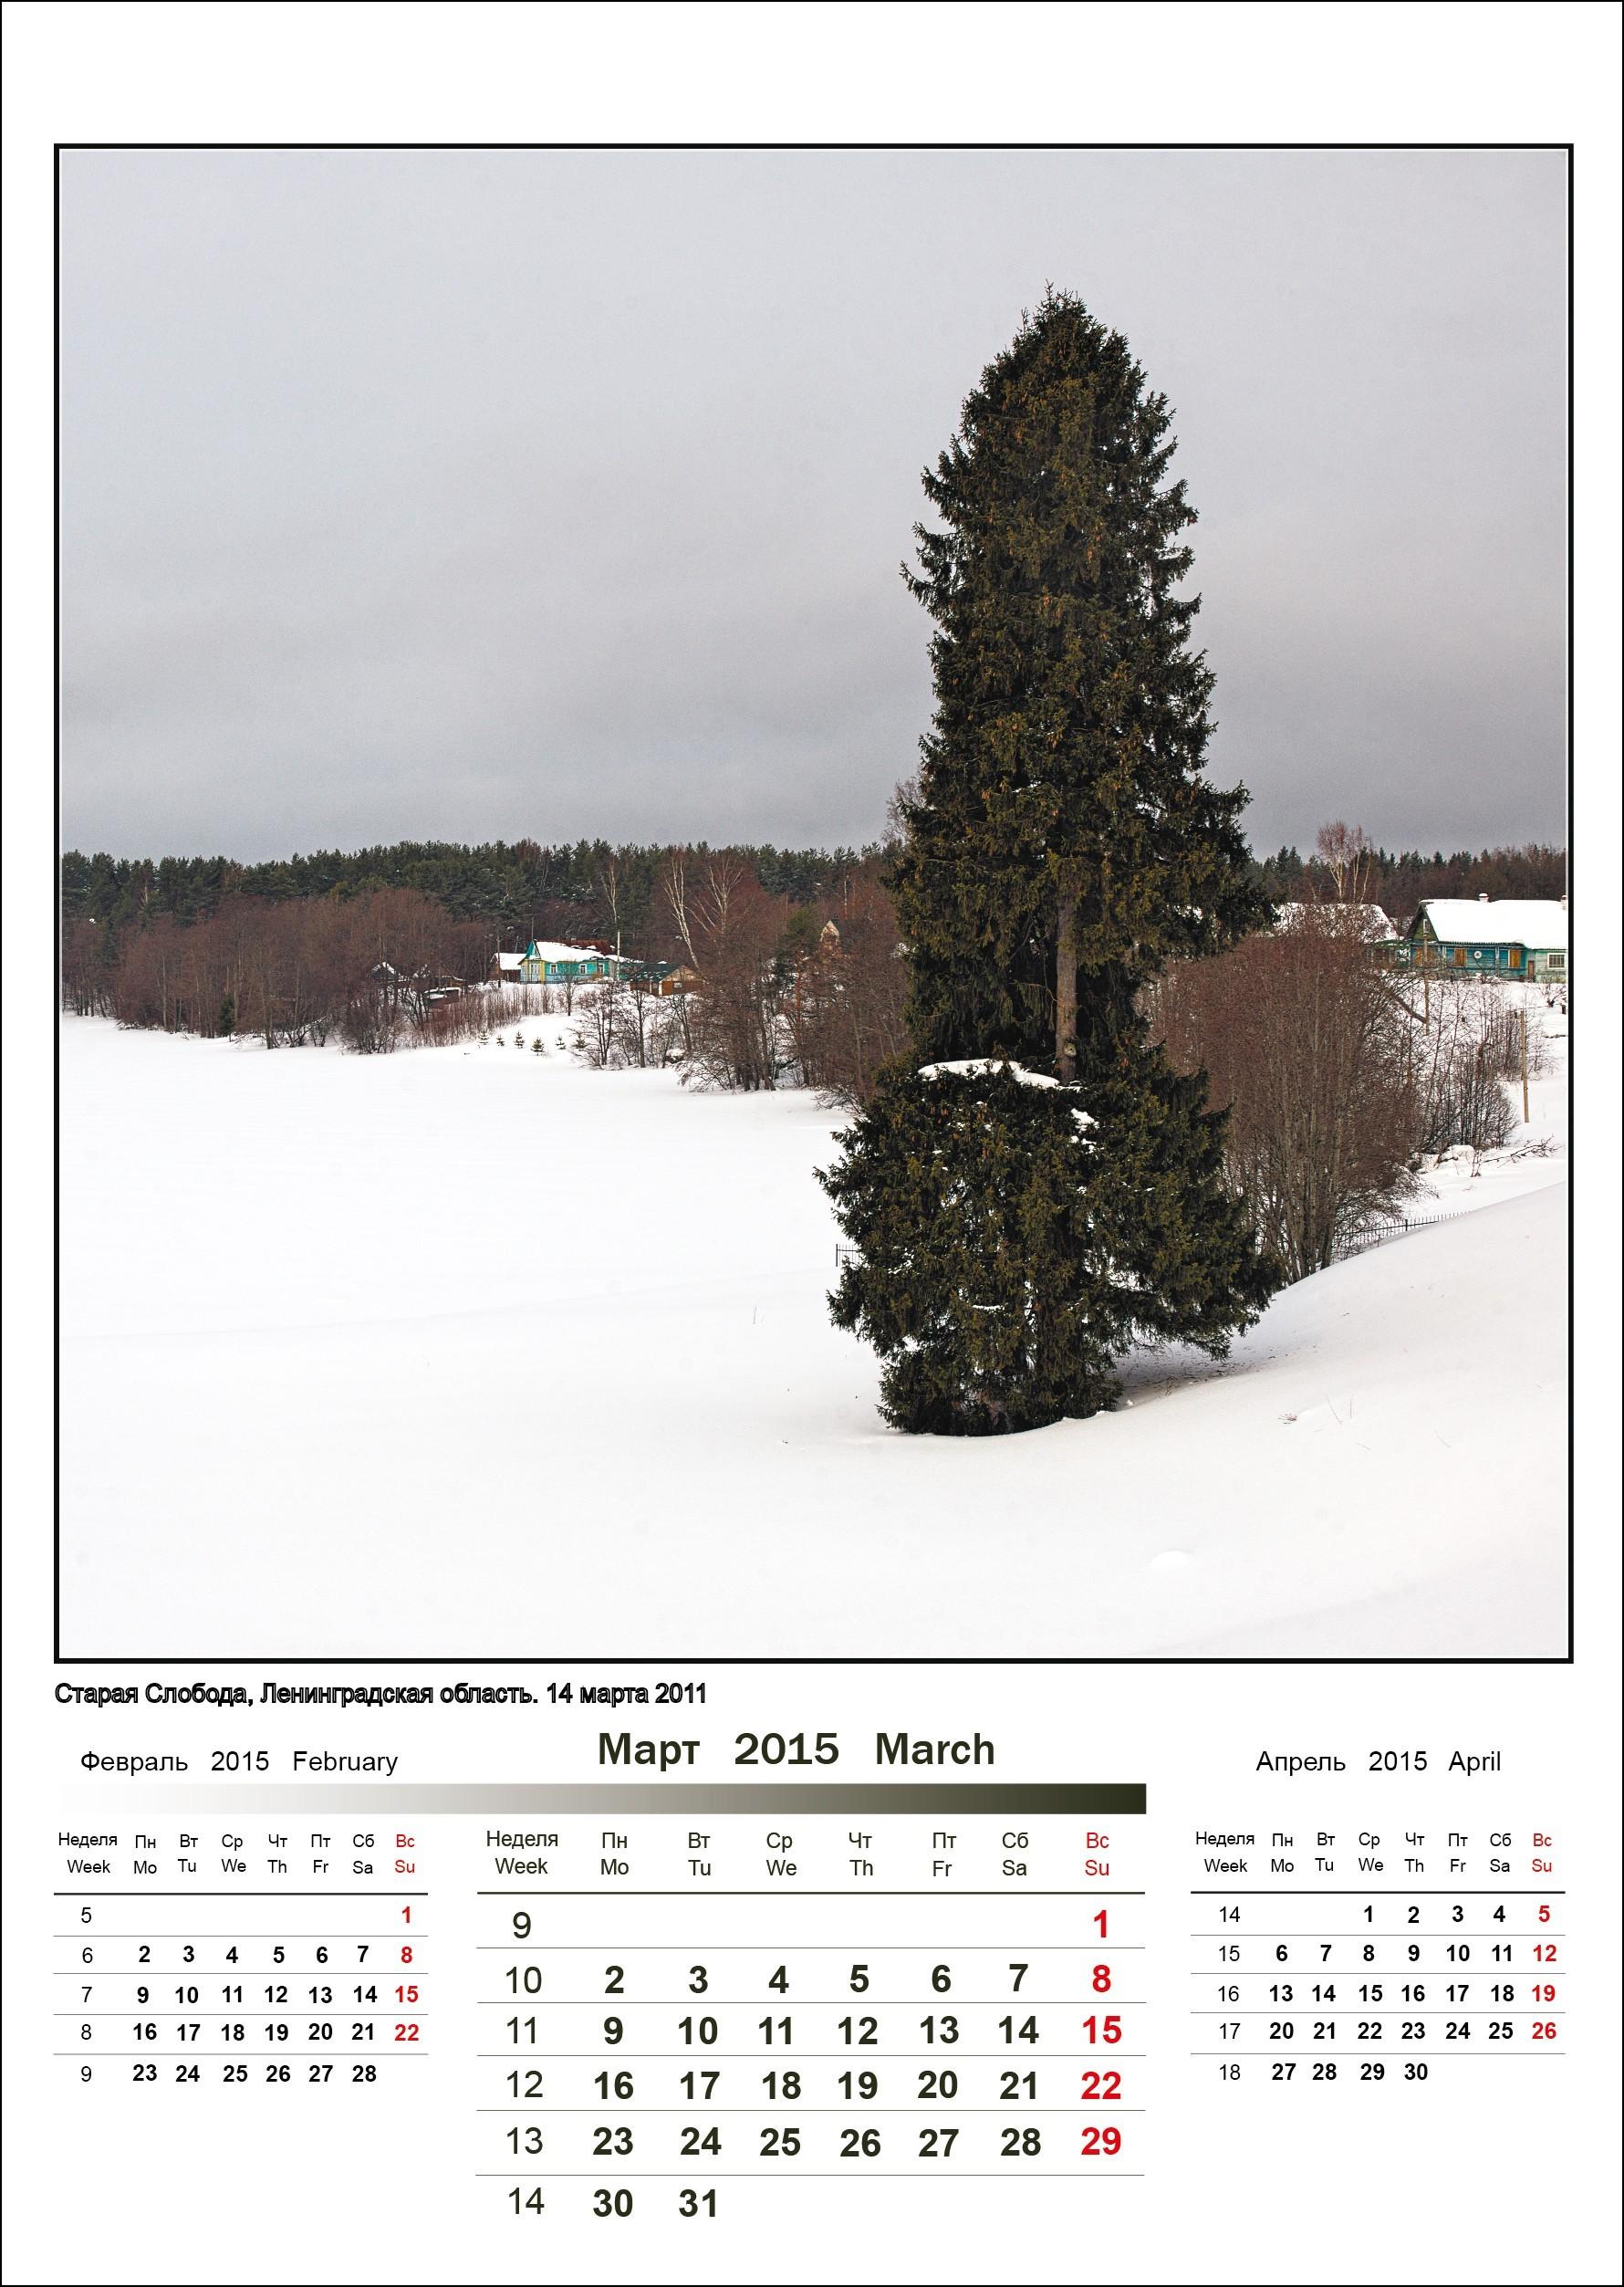 03_calendar_nv_march